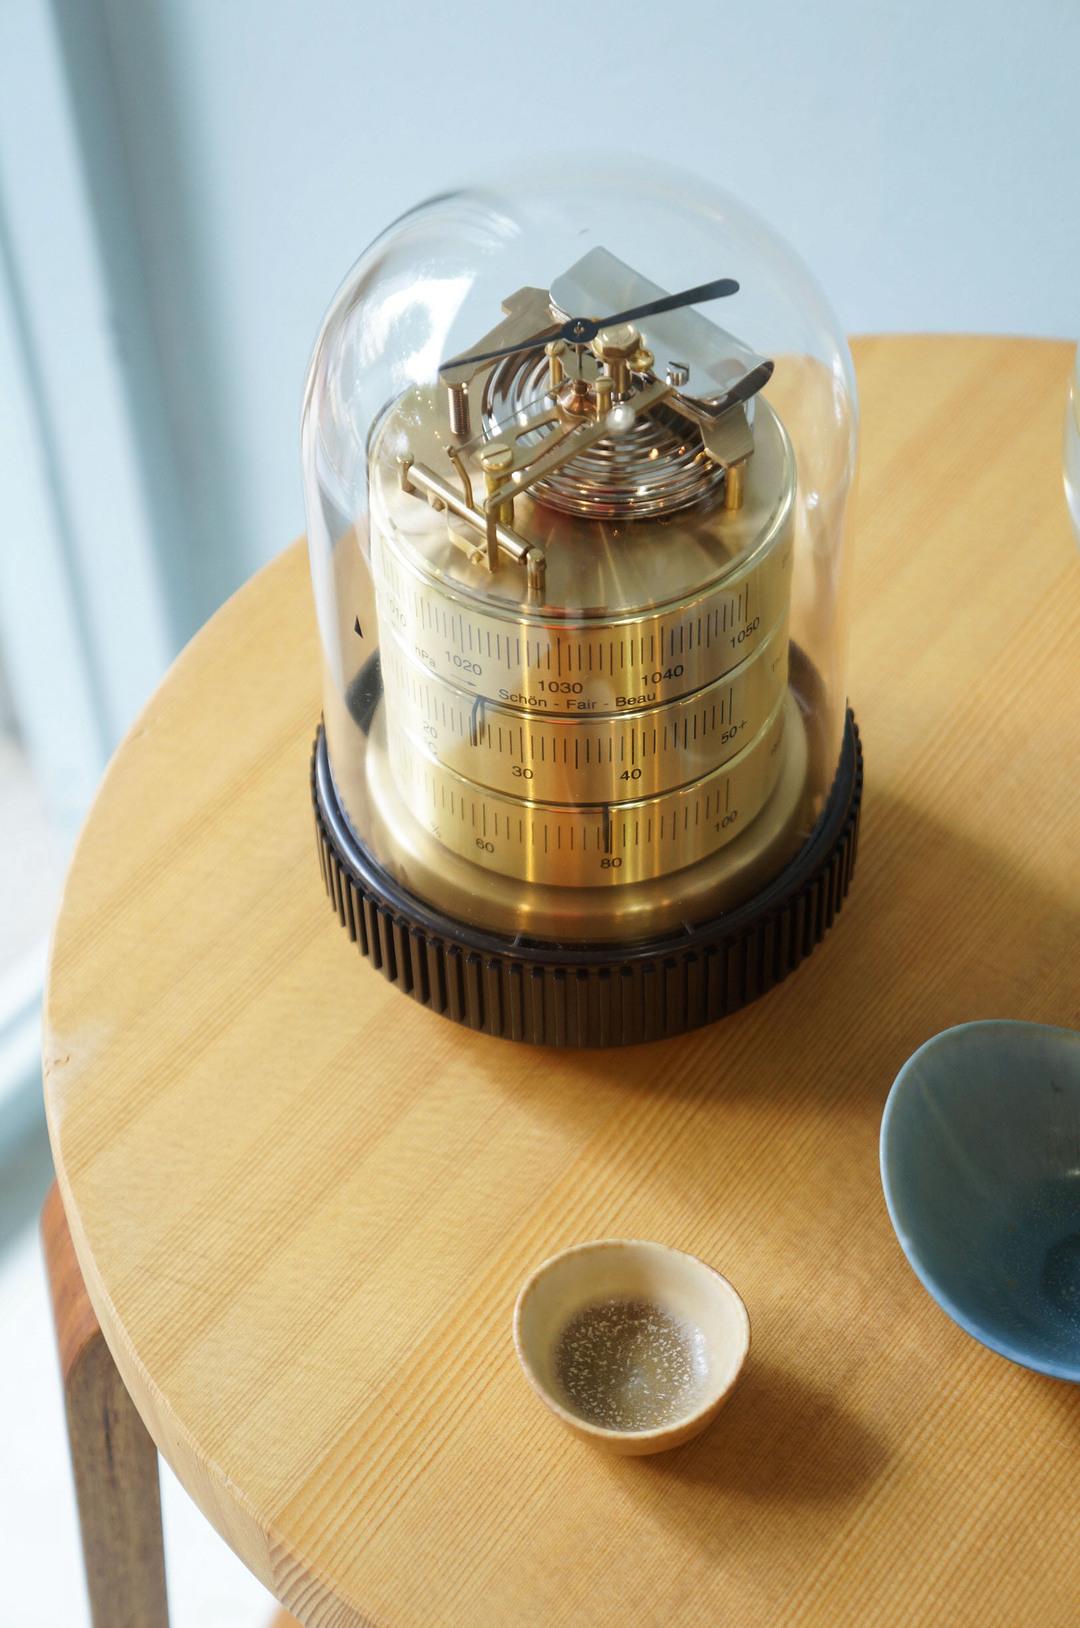 BARIGO Hygrothermograph&Barometer made in Germany/バリゴ 温湿気圧計 3025型 ドイツ製 ゴールド インテリア